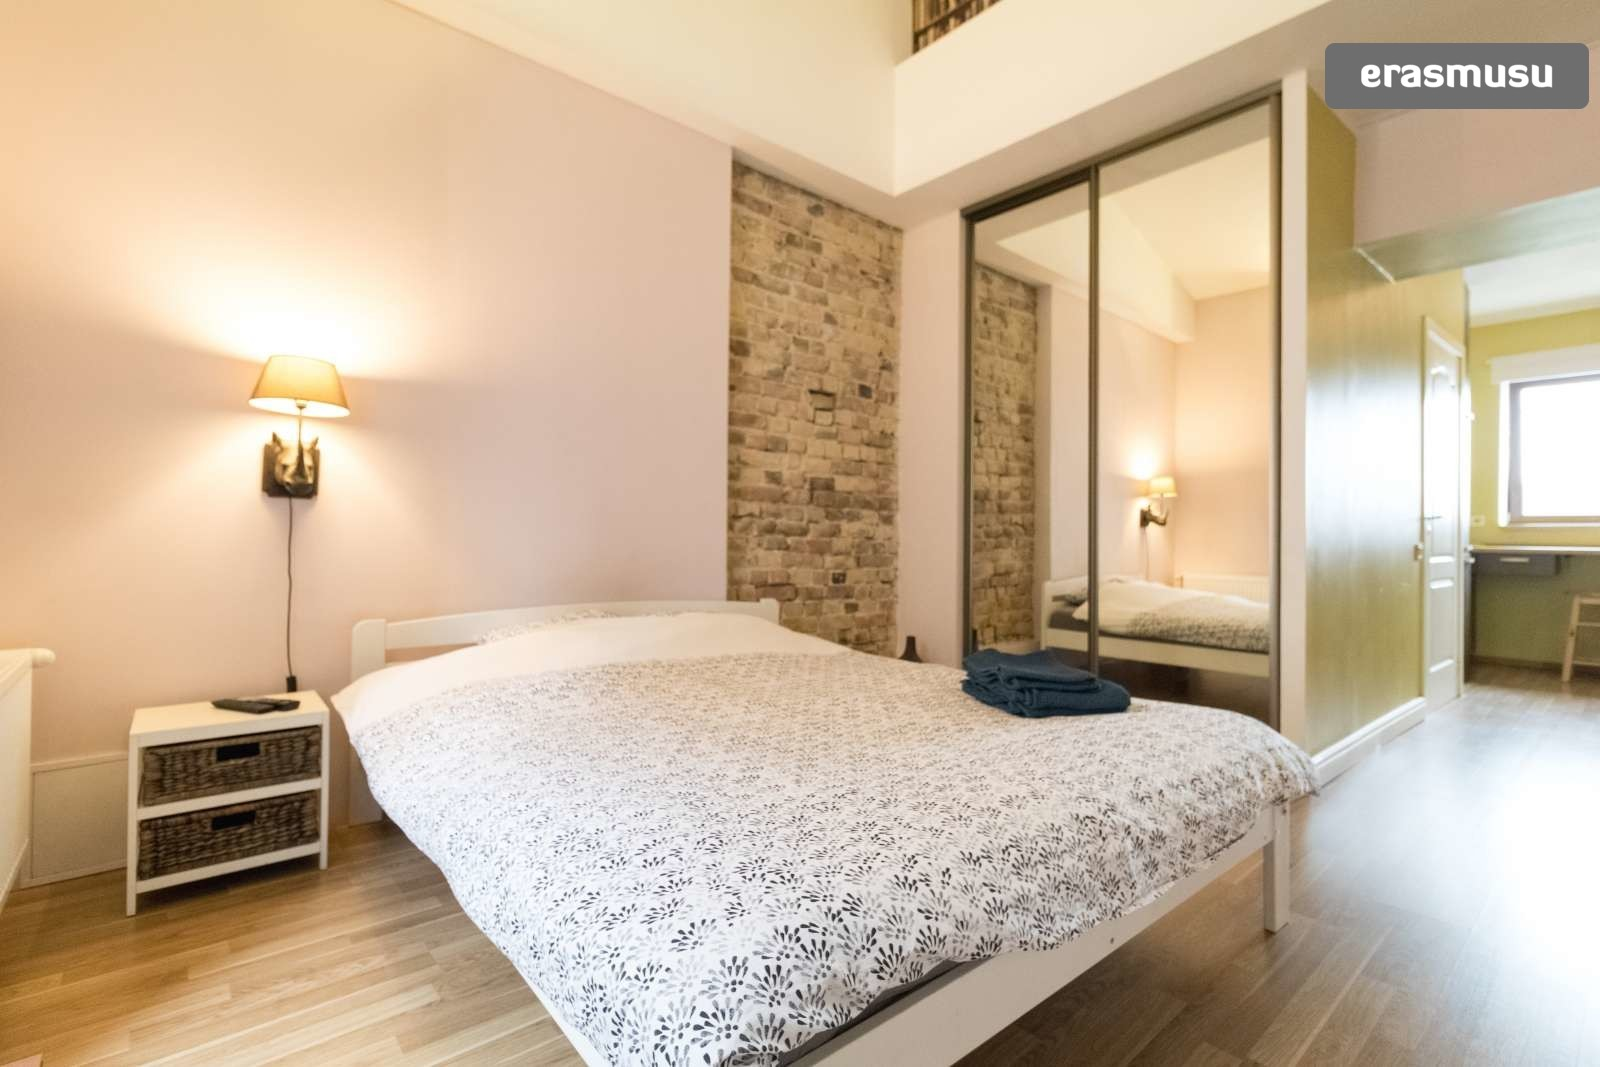 modern-studio-apartment-rent-maskavas-forstate-389a1893cb54a0206